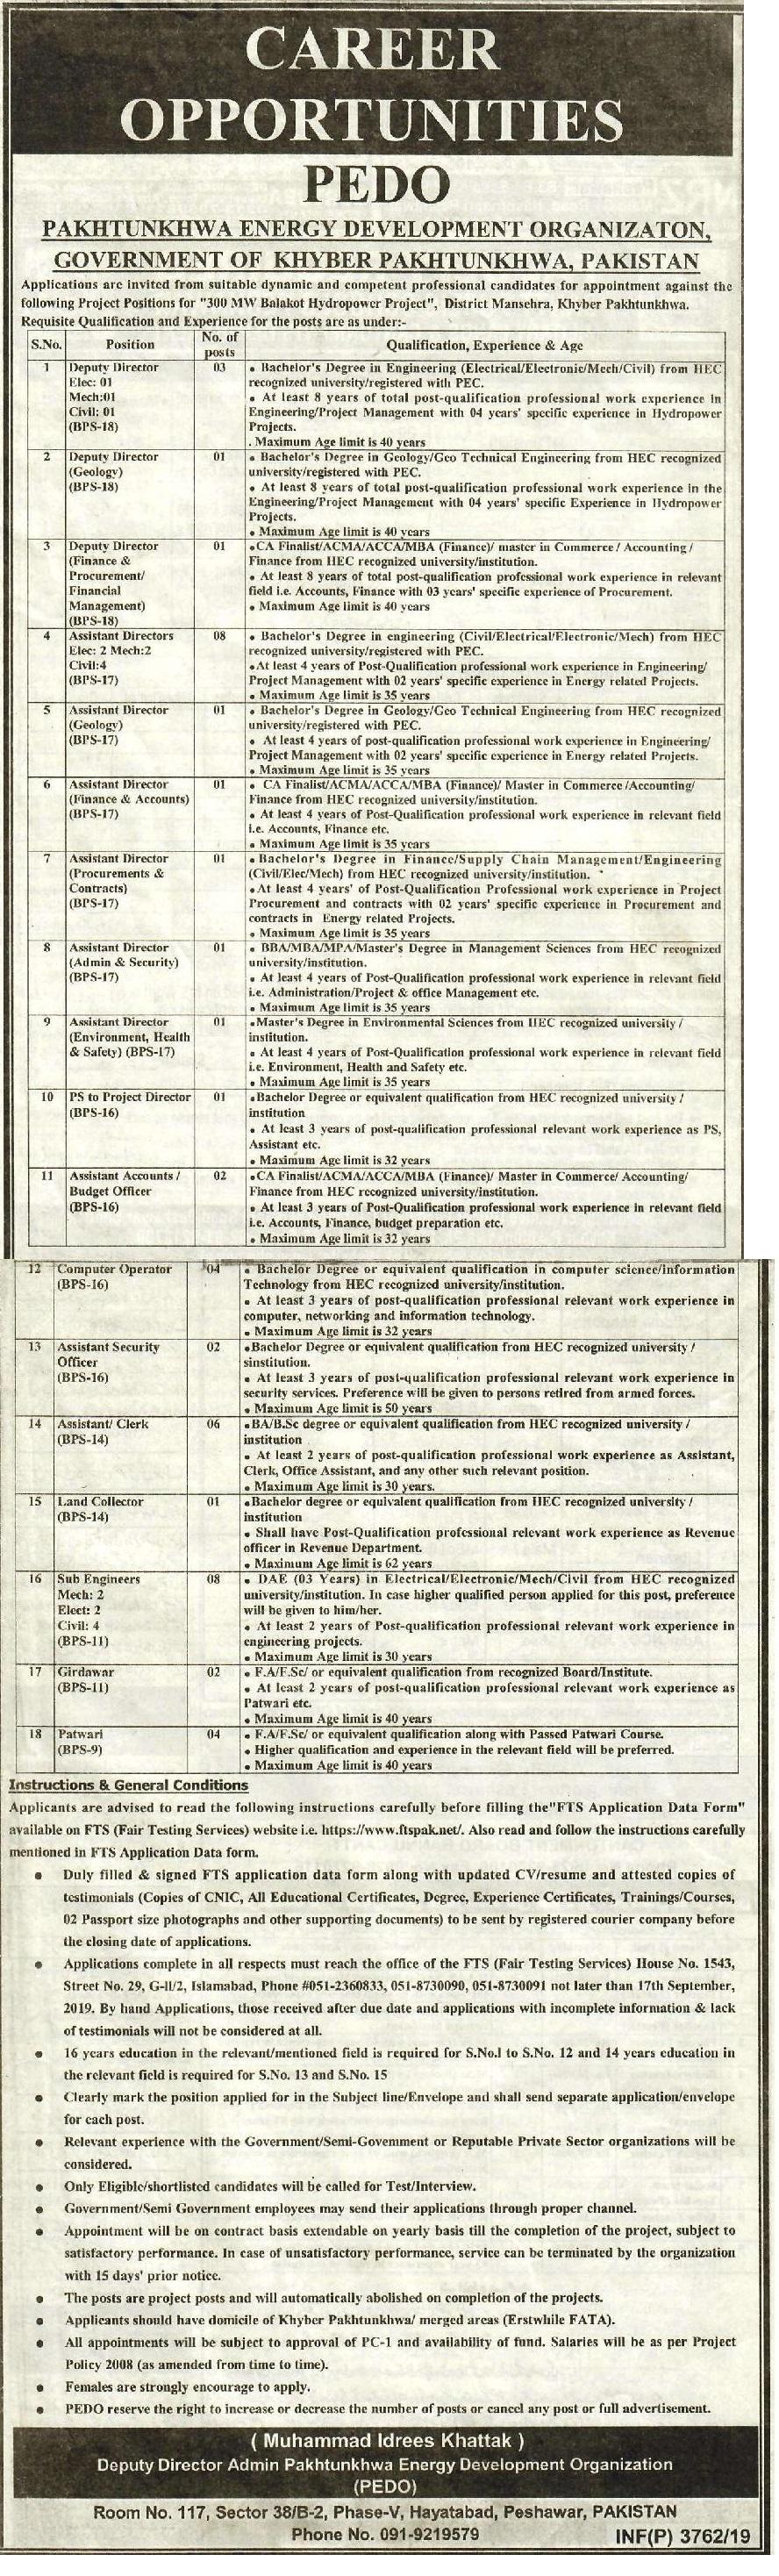 KPK Energy Development Organization FTS Jobs 2019 Application Form Roll No Slip